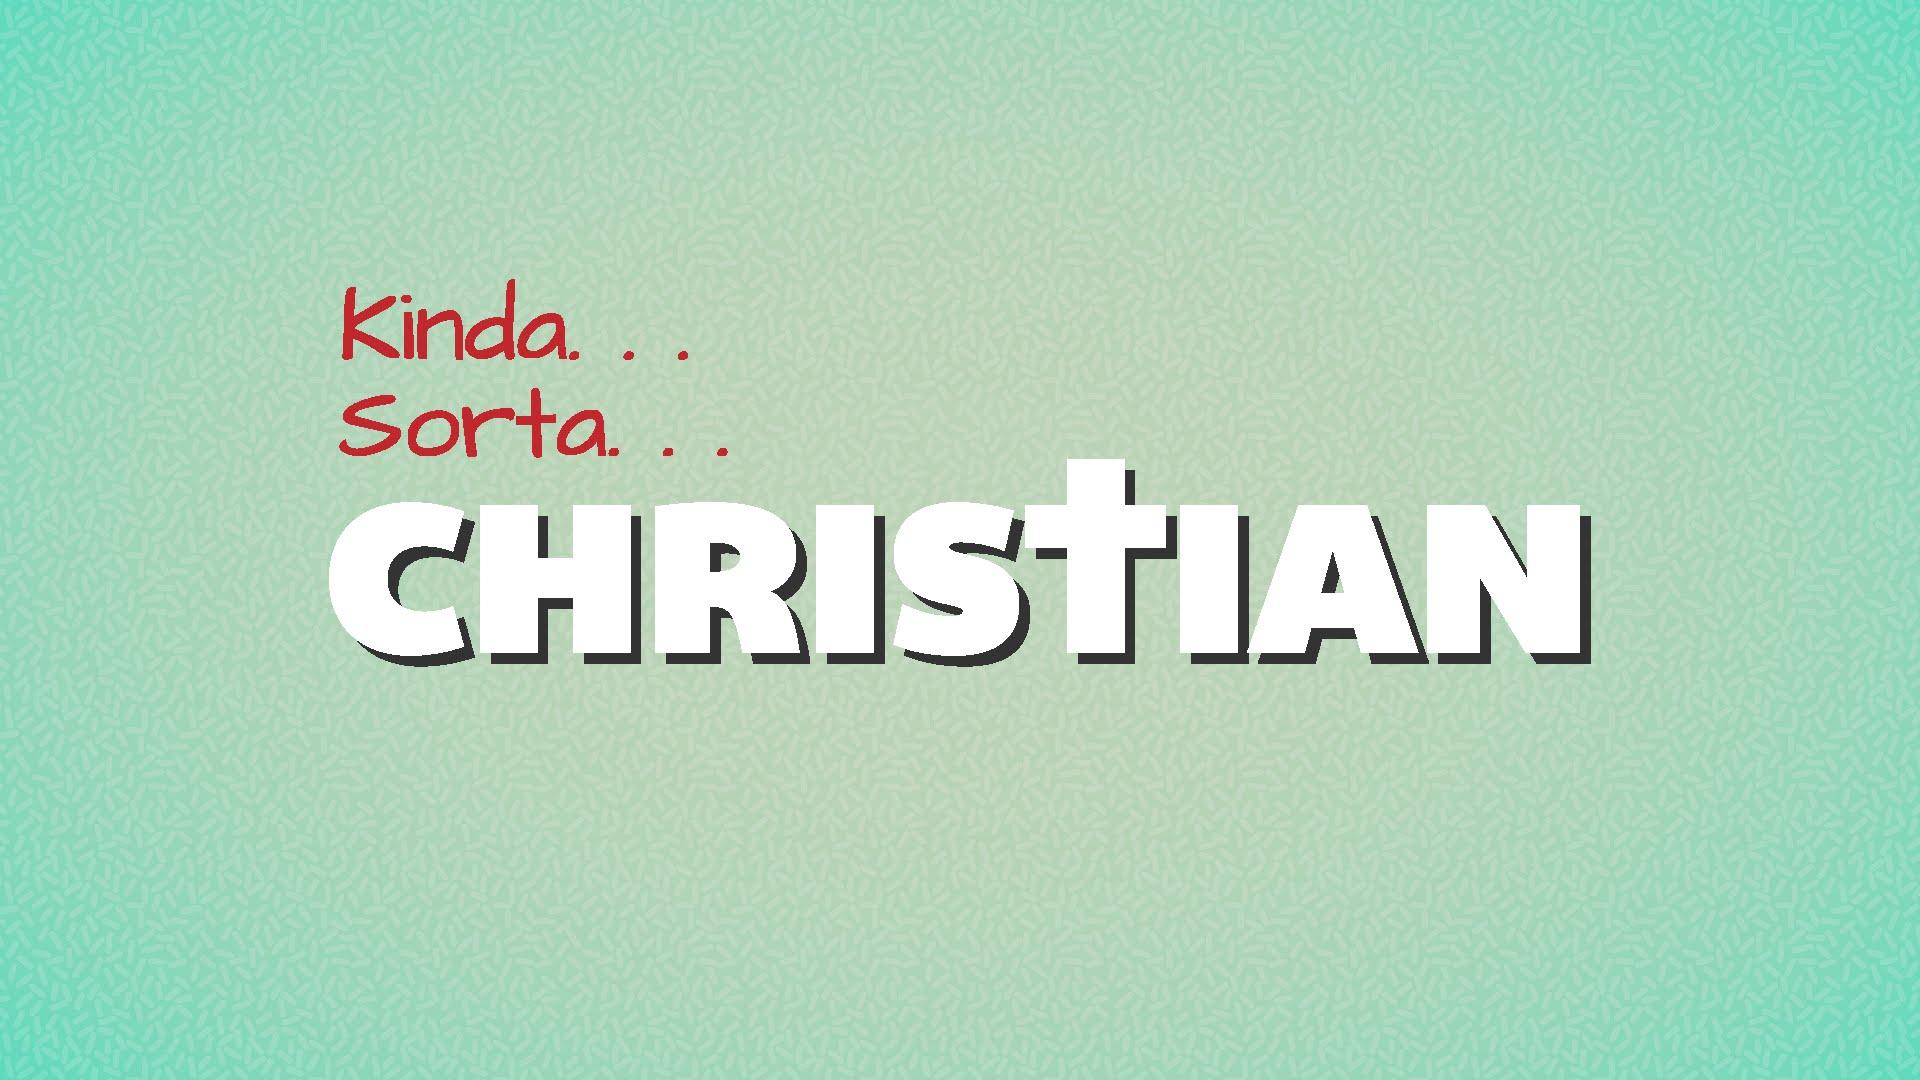 I'm a Christian, But I Want God My Way